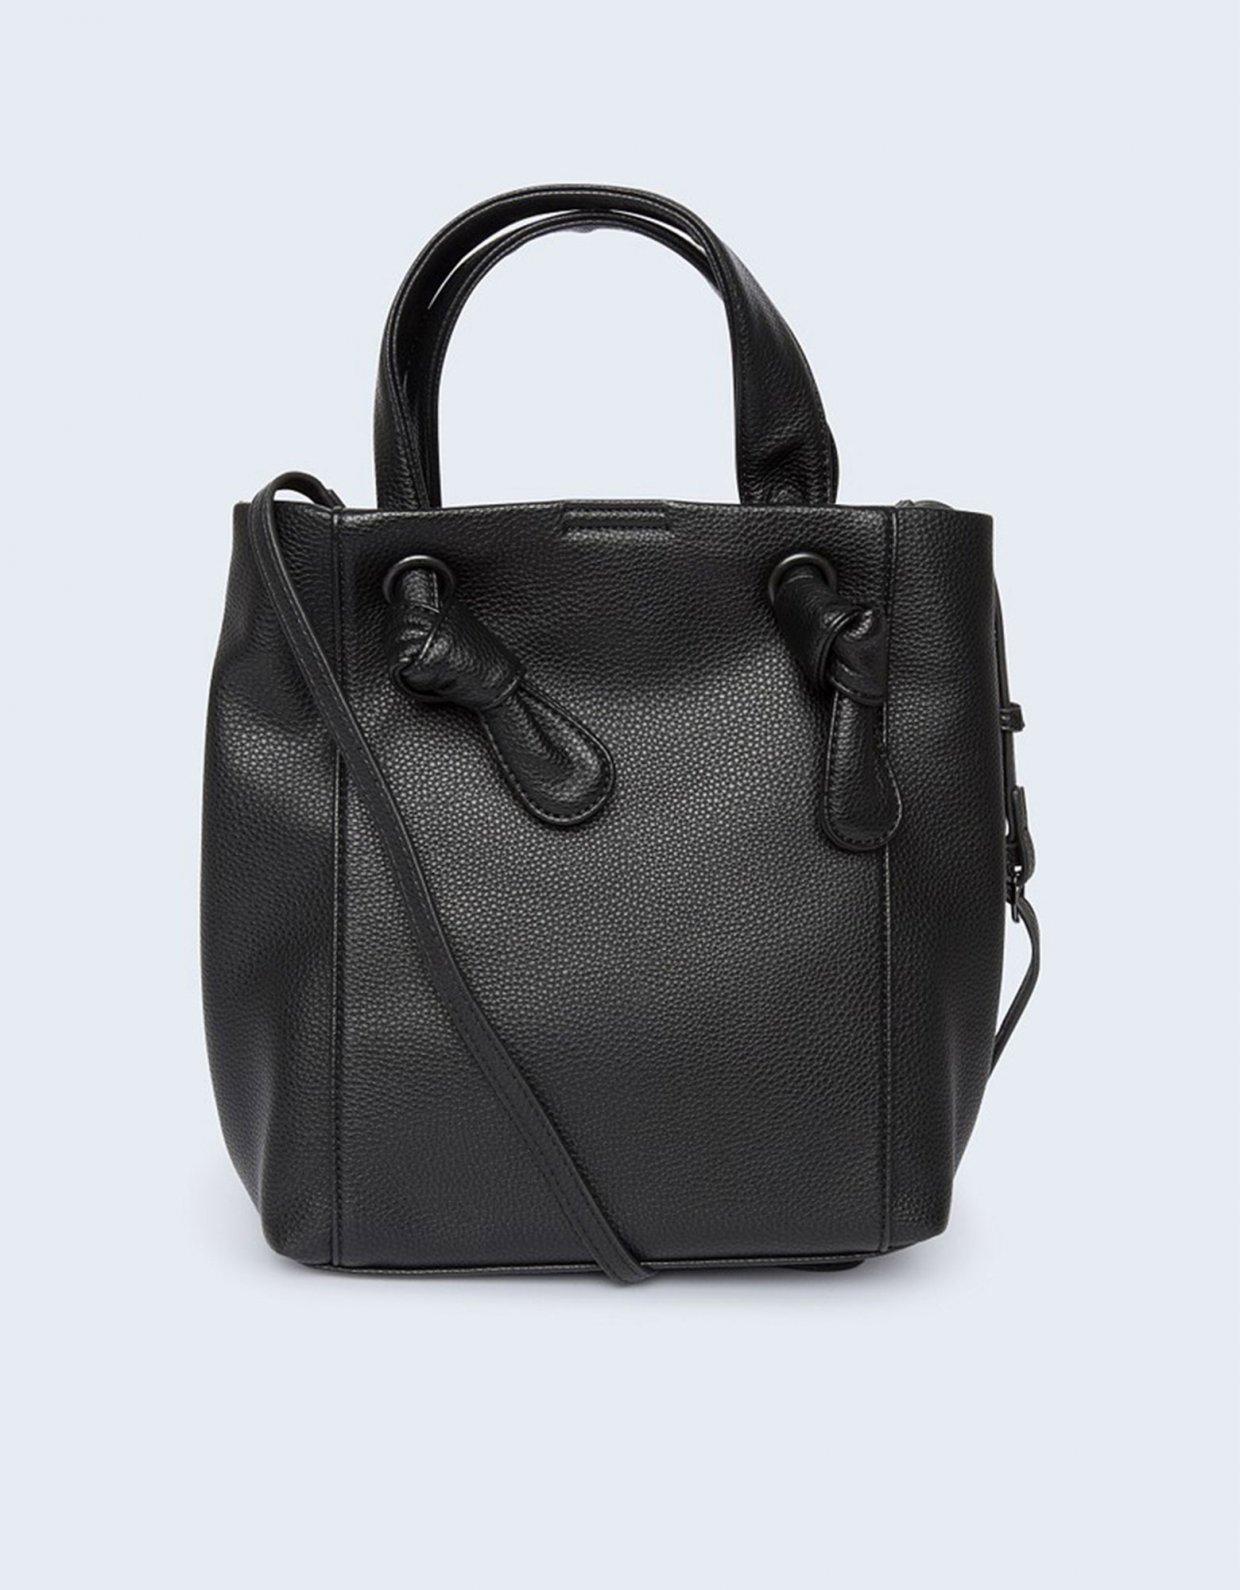 Pepe Jeans Areia bag black